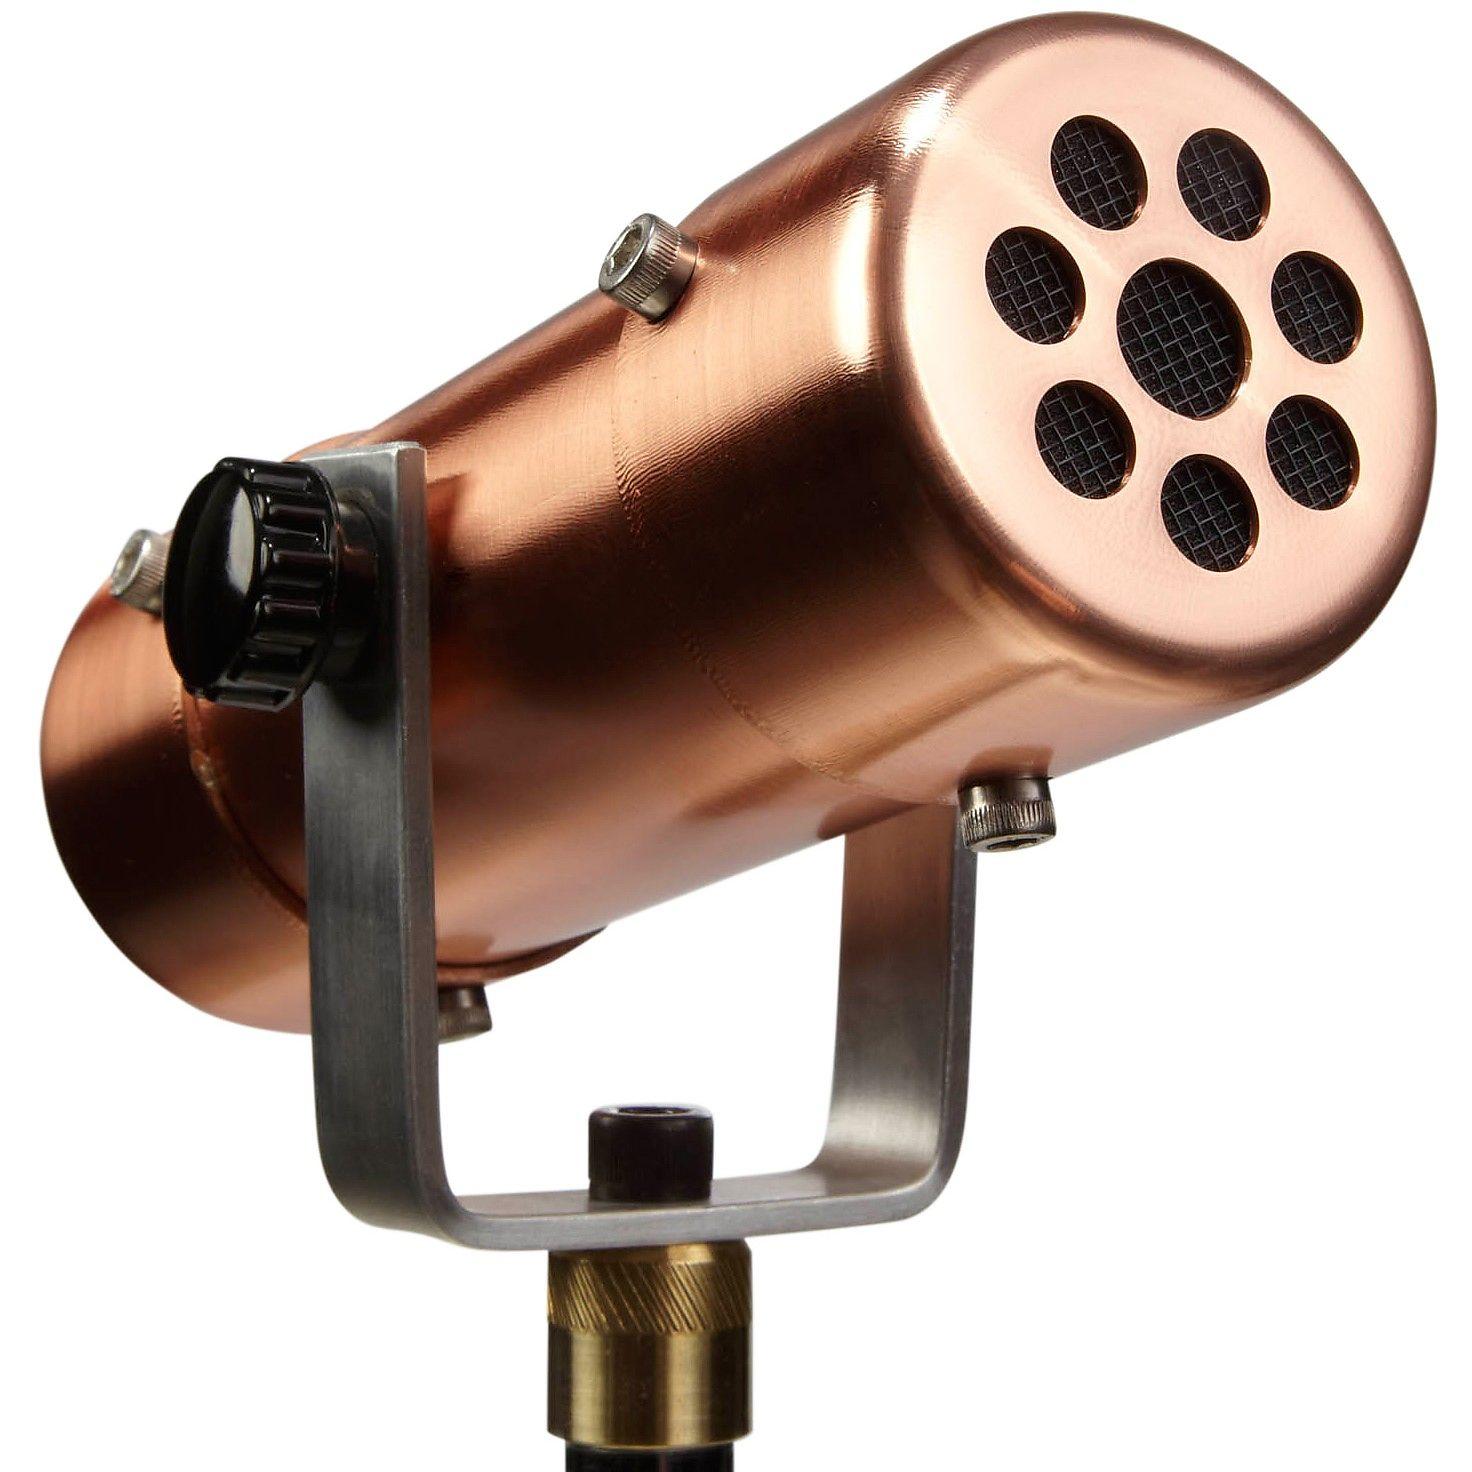 Placid Audio Copperphone - amazon.com